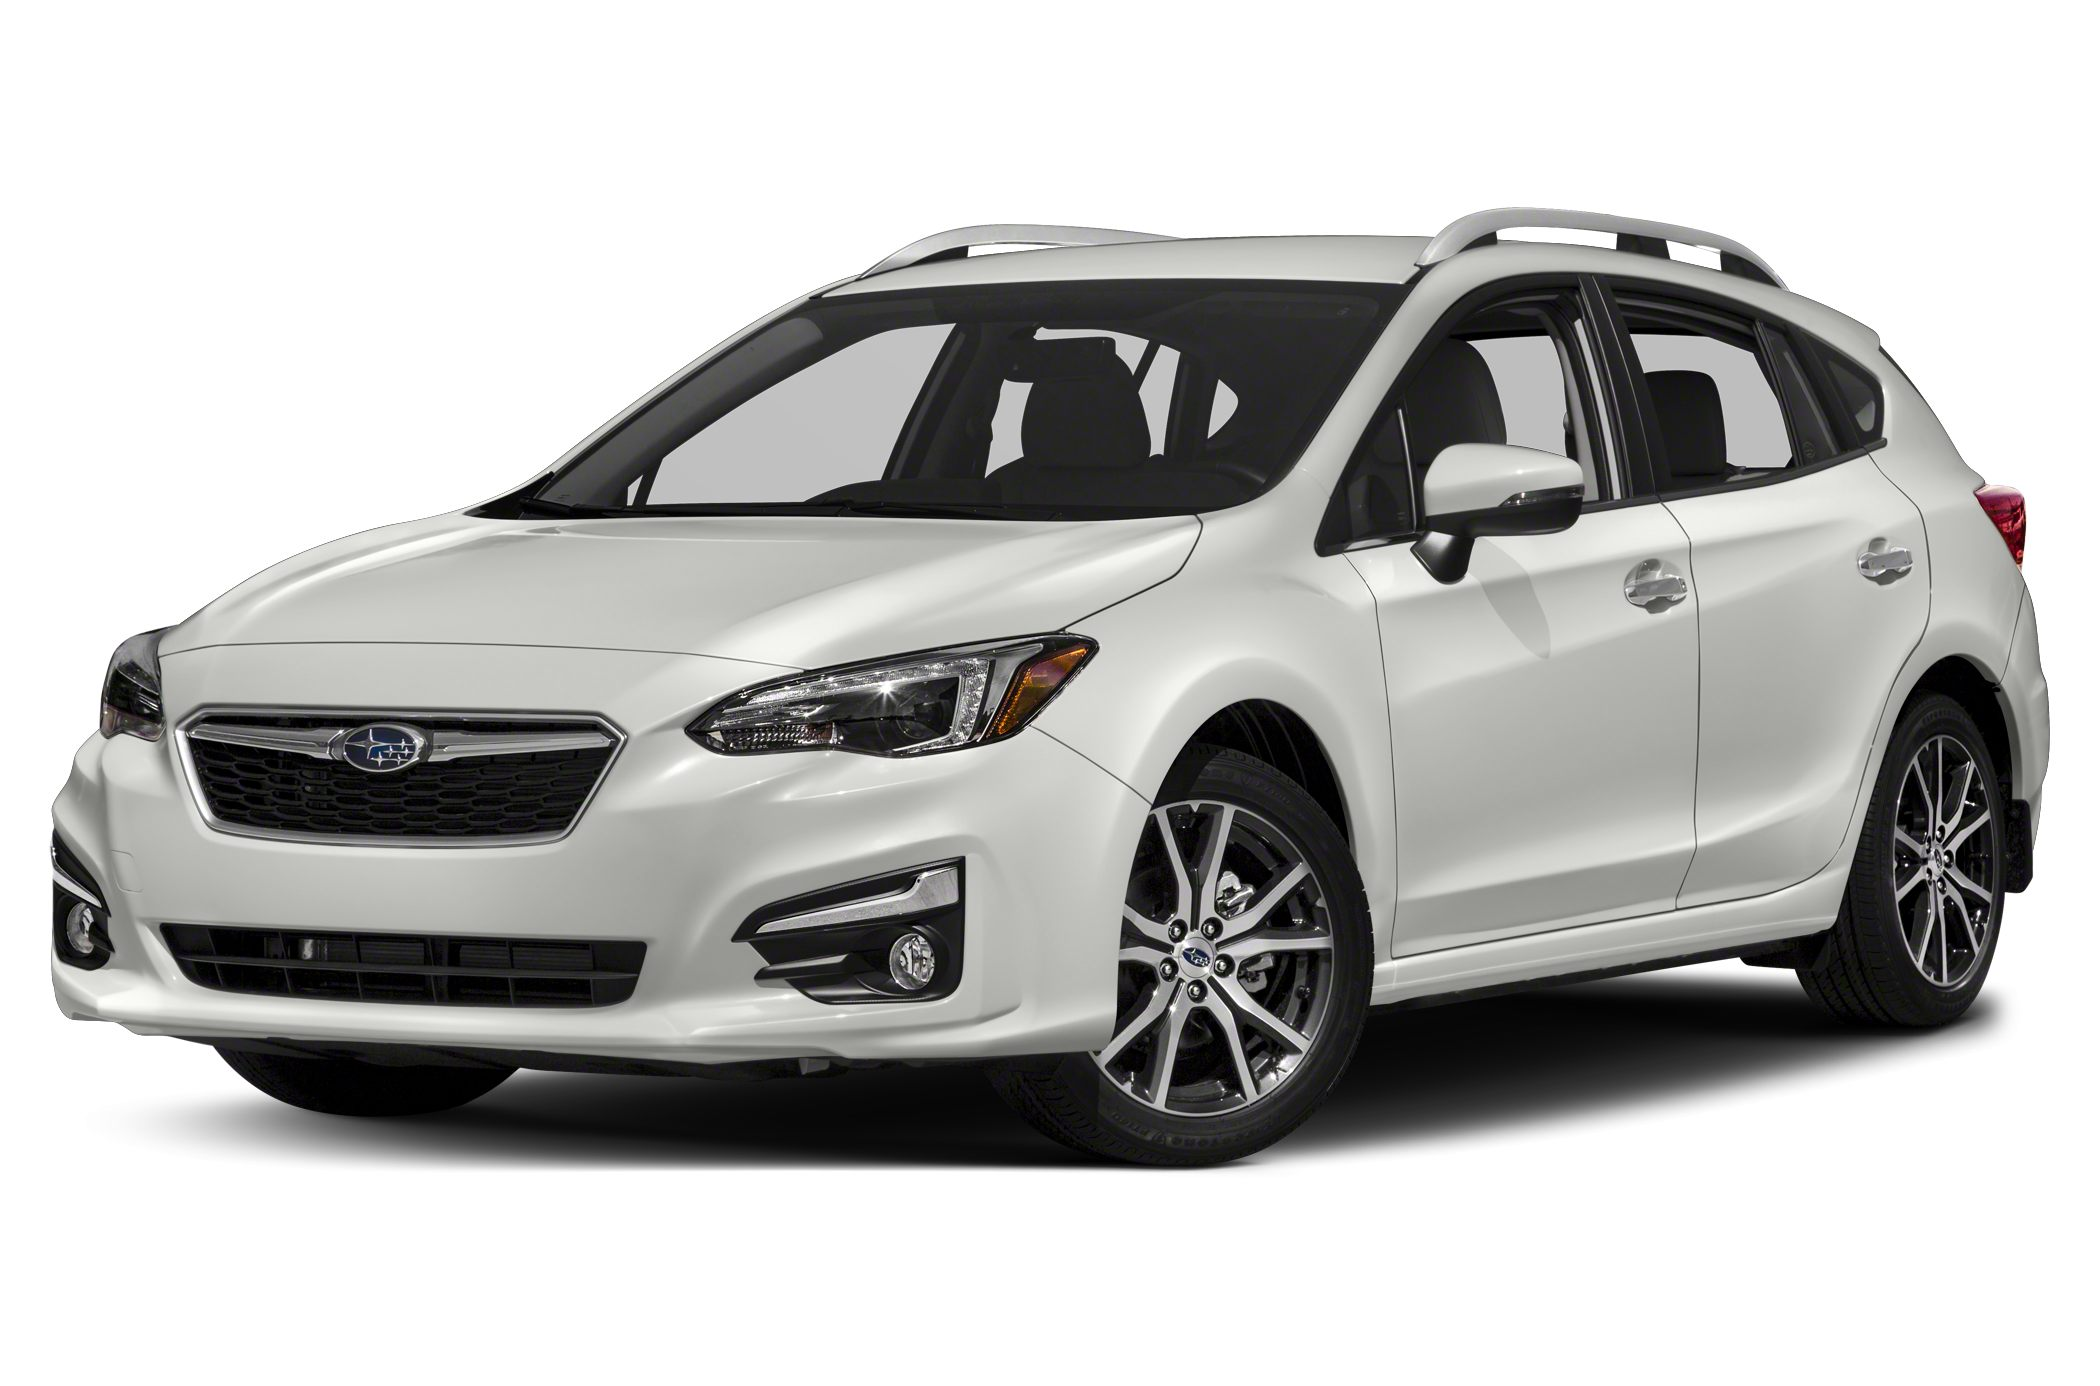 2017 Subaru Impreza 2.0i Limited 4dr All-wheel Drive Hatchback